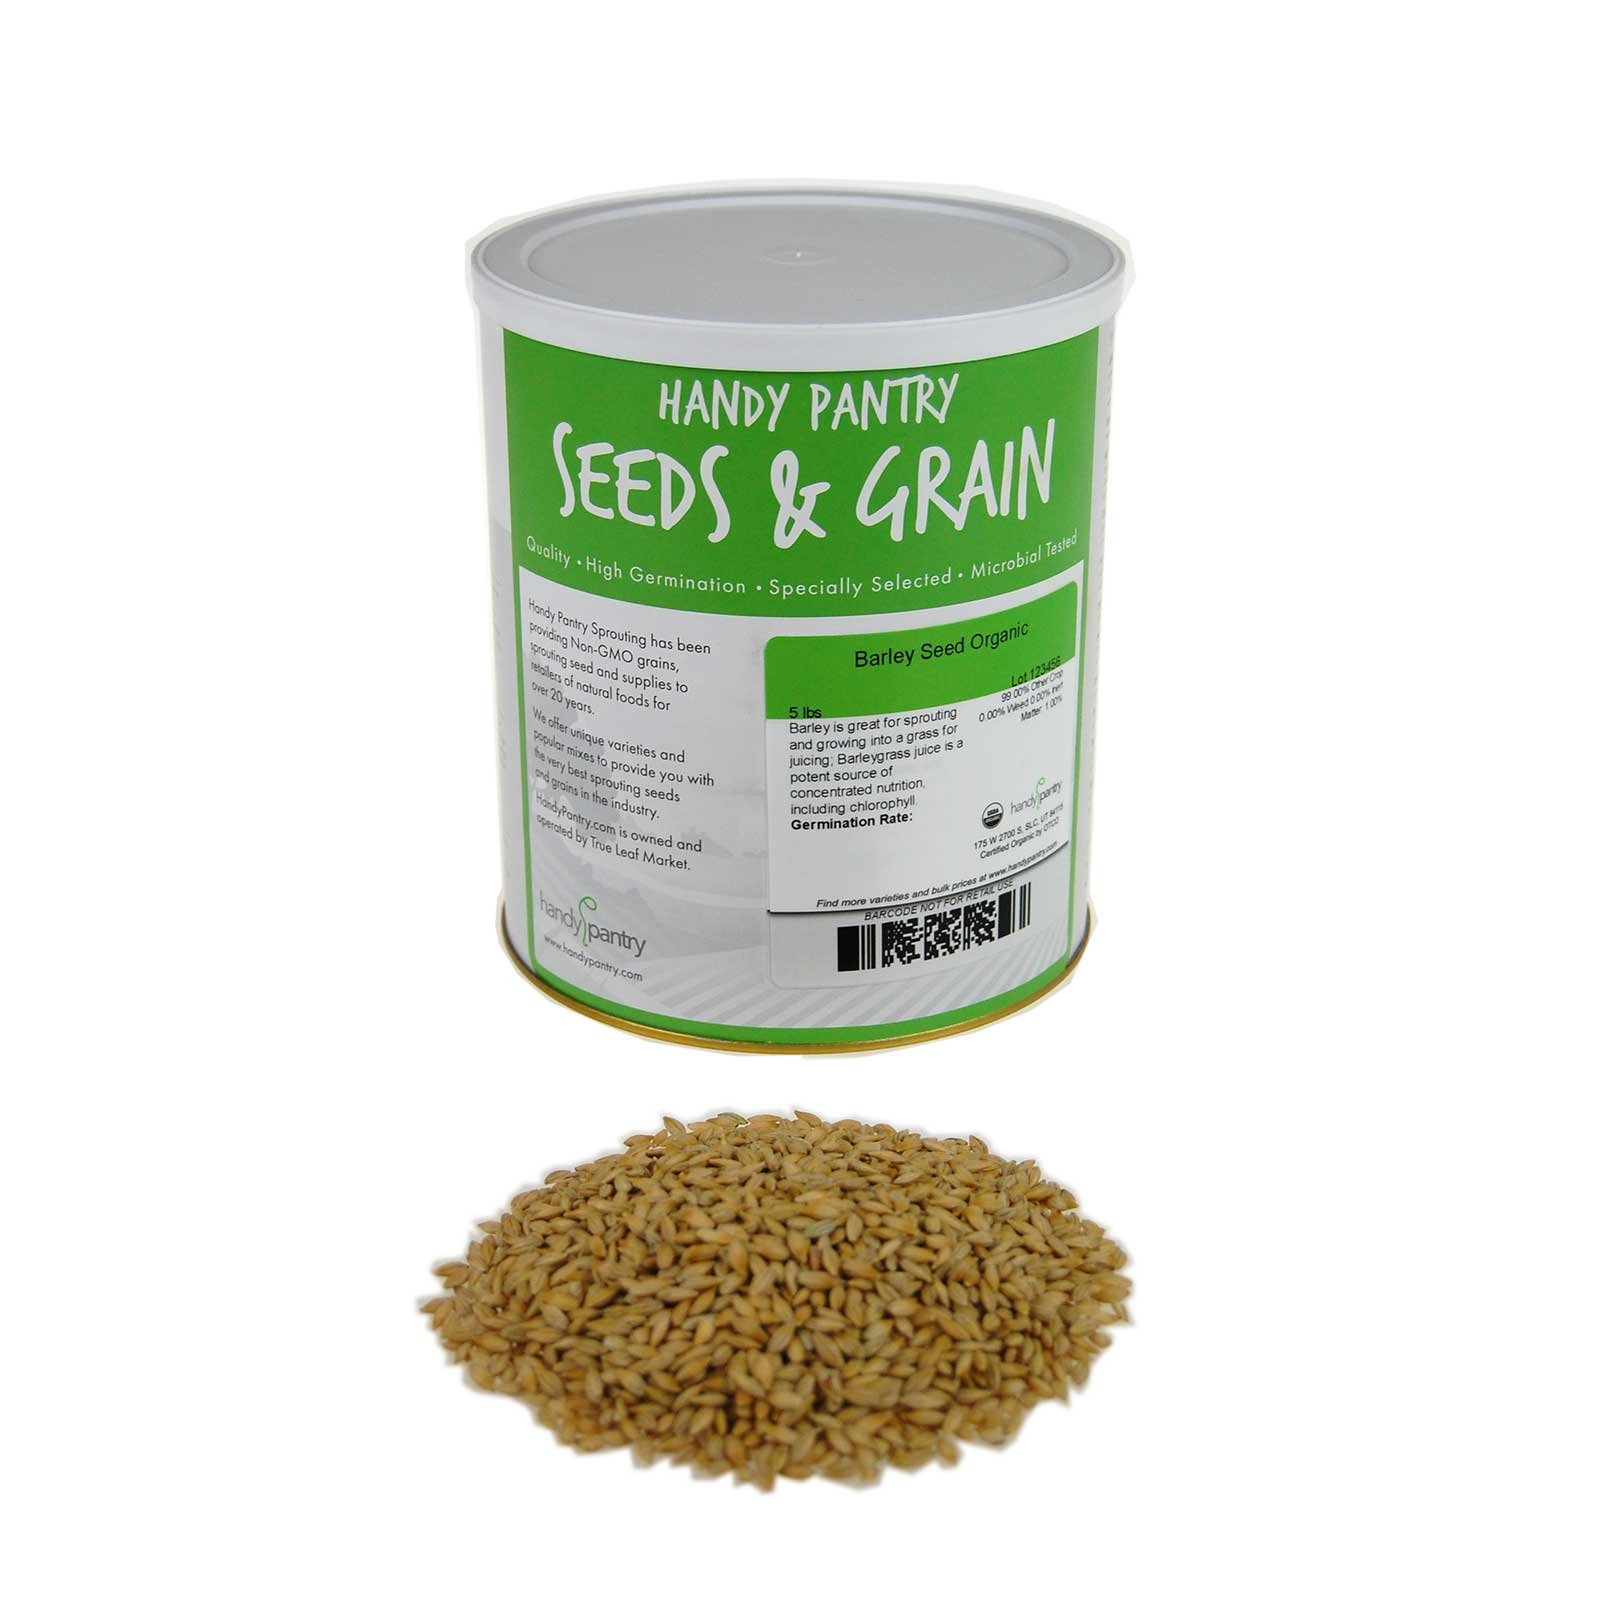 Organic Barley Seeds -4.5 Lbs - Whole (Hull Intact) Barleygrass Seed - Ornamental Barley Grass, Juicing - Grain for Beer Making, Emergency Food Storage & More by Handy Pantry (Image #1)